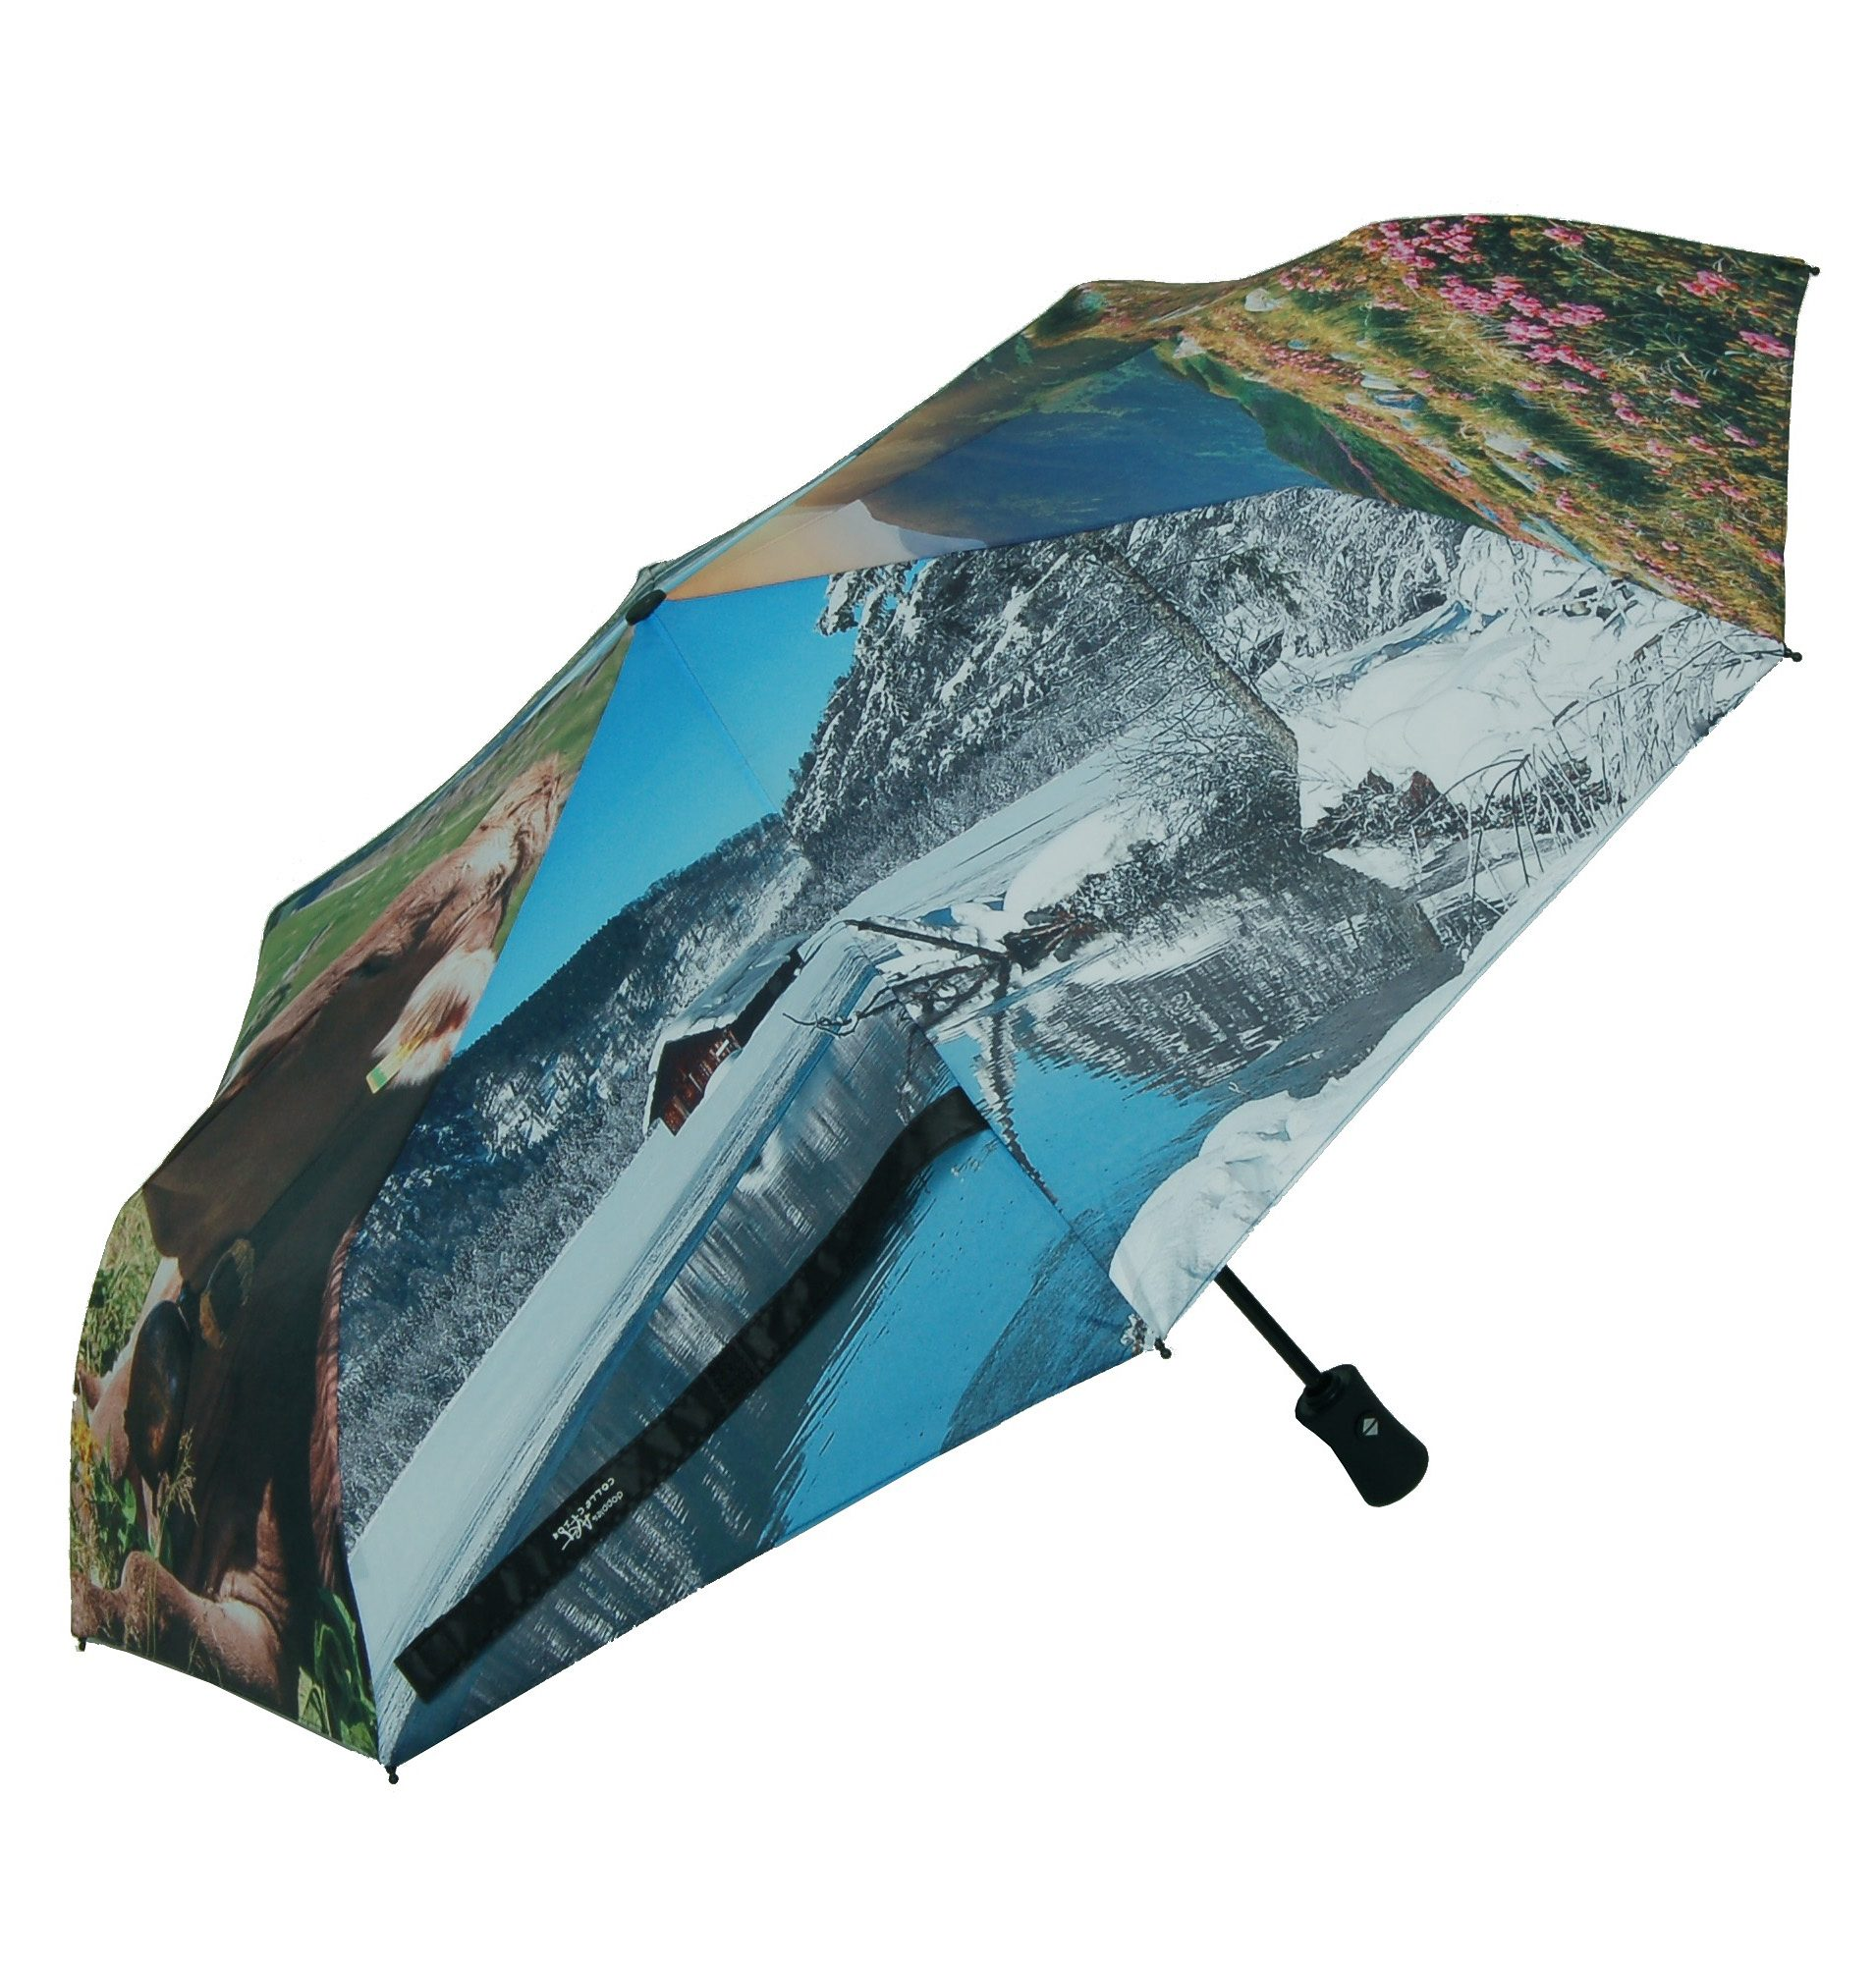 Doppler Regenschirm, »Taschenschirm Almrausch«